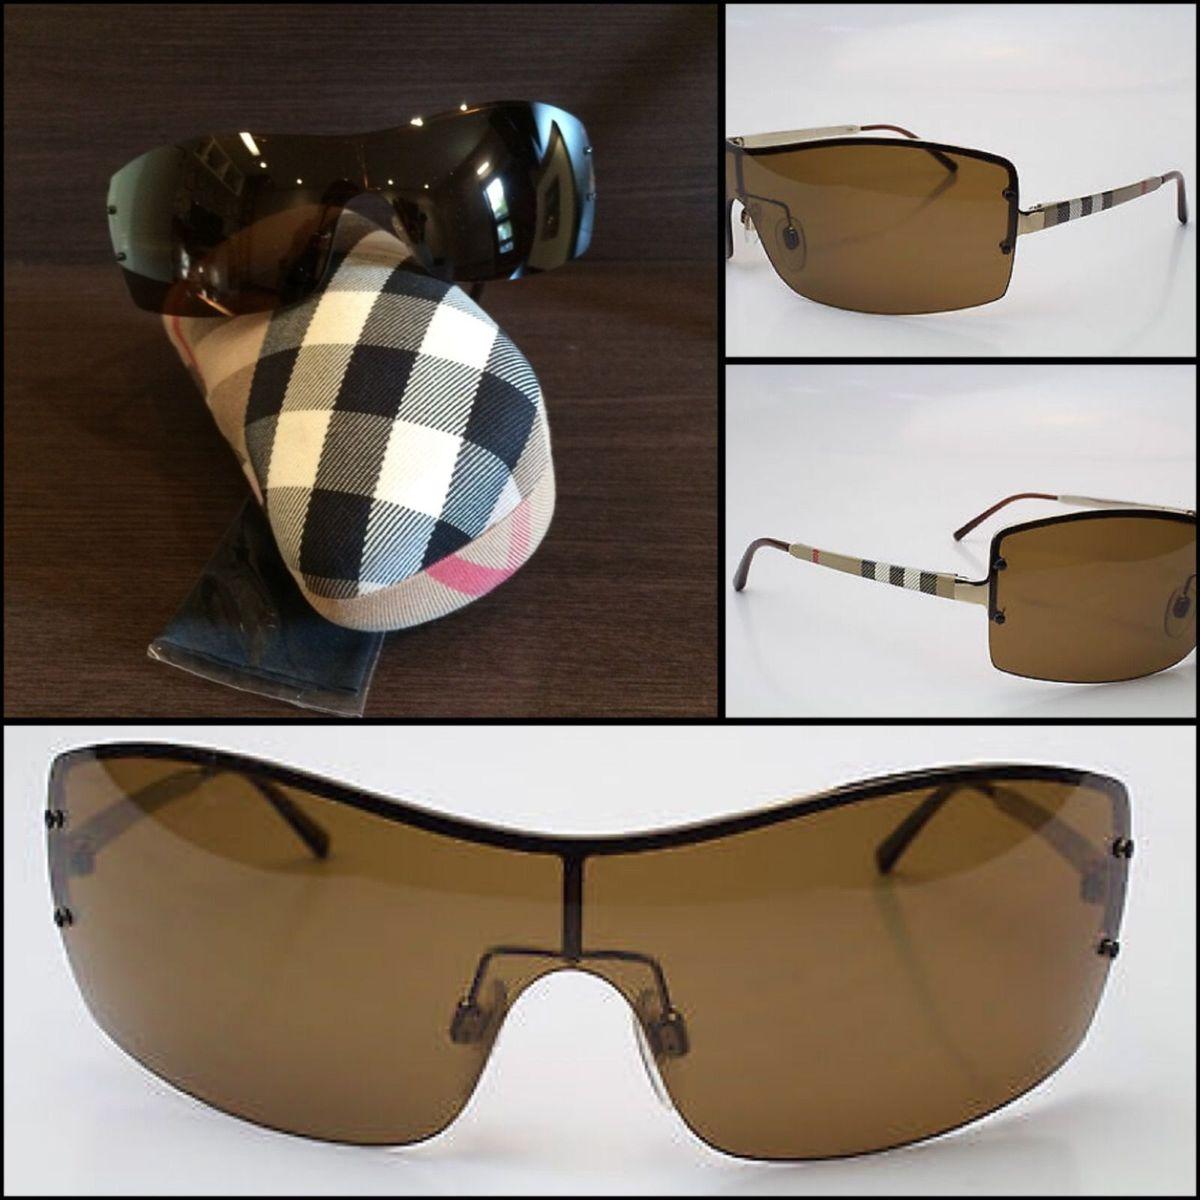 óculos de sol estilo máscara - óculos burberry.  Czm6ly9wag90b3muzw5qb2vplmnvbs5ici9wcm9kdwn0cy85ota3ndgvzwjimznjngzhmzlmotm1mgqynwy3owywmdljoweyowyuanbn c6ce9be3ea